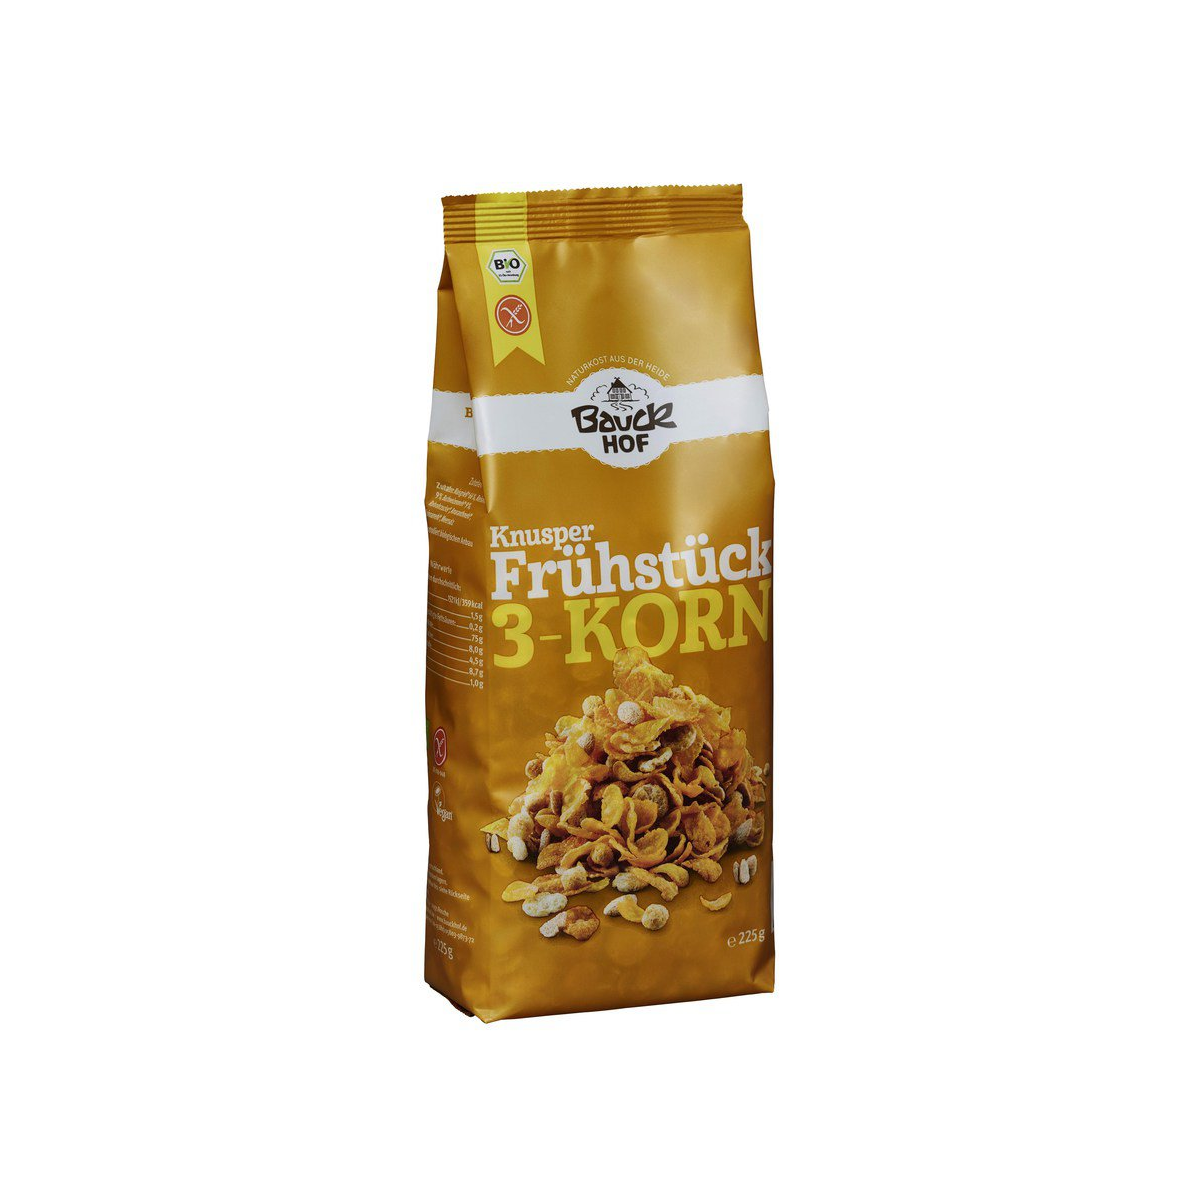 Knusperfrühstück 3-Korn glutenfrei